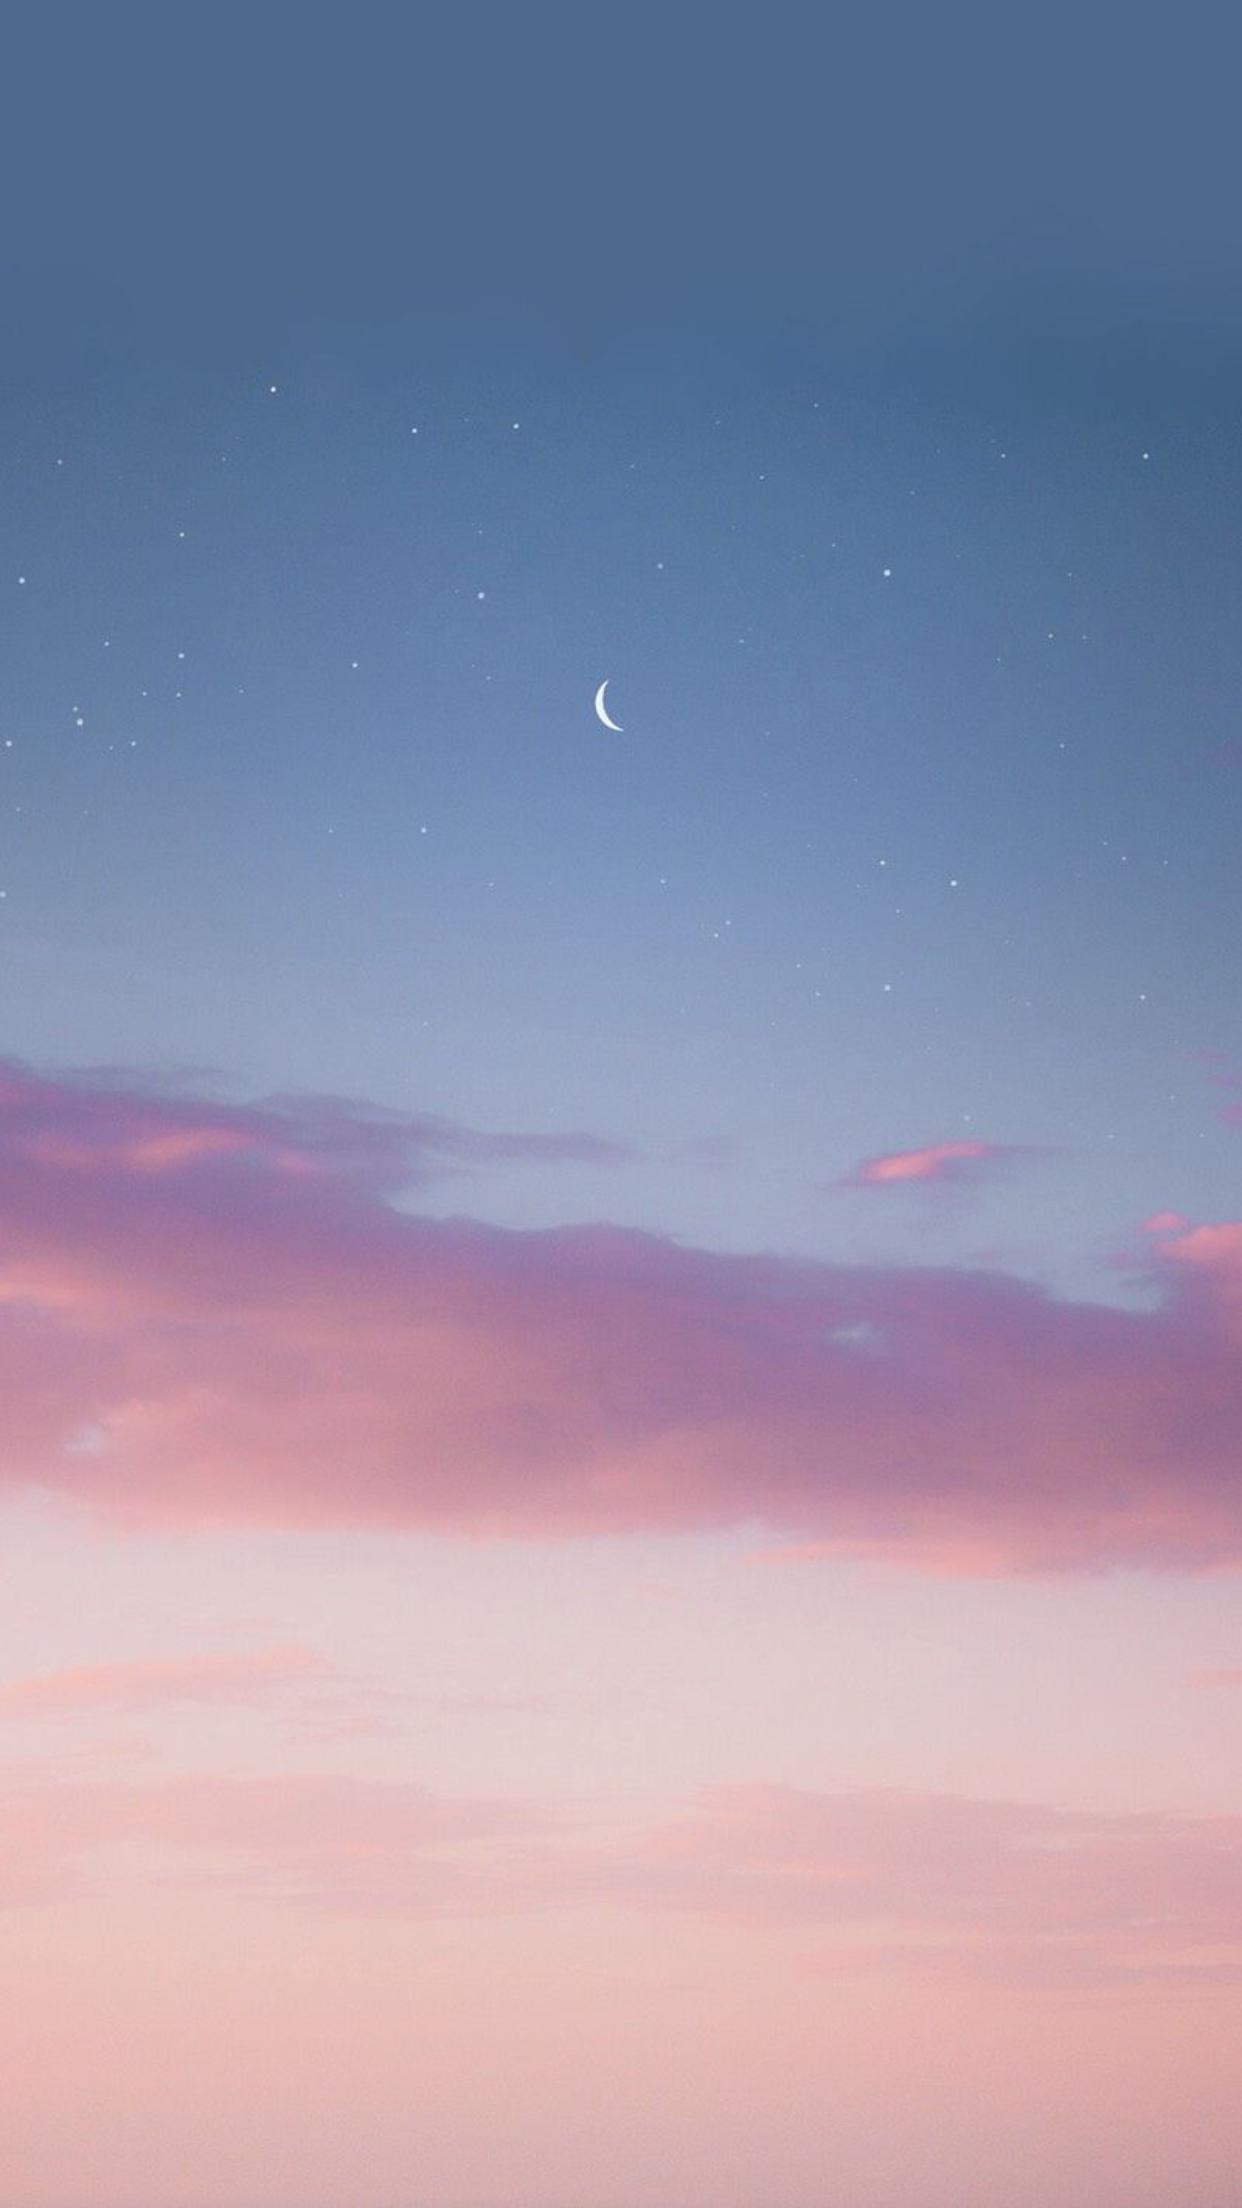 Evening Sky Wallpaper วอลเปเปอร์, แบคกราวน์ไอโฟน, วอลเป